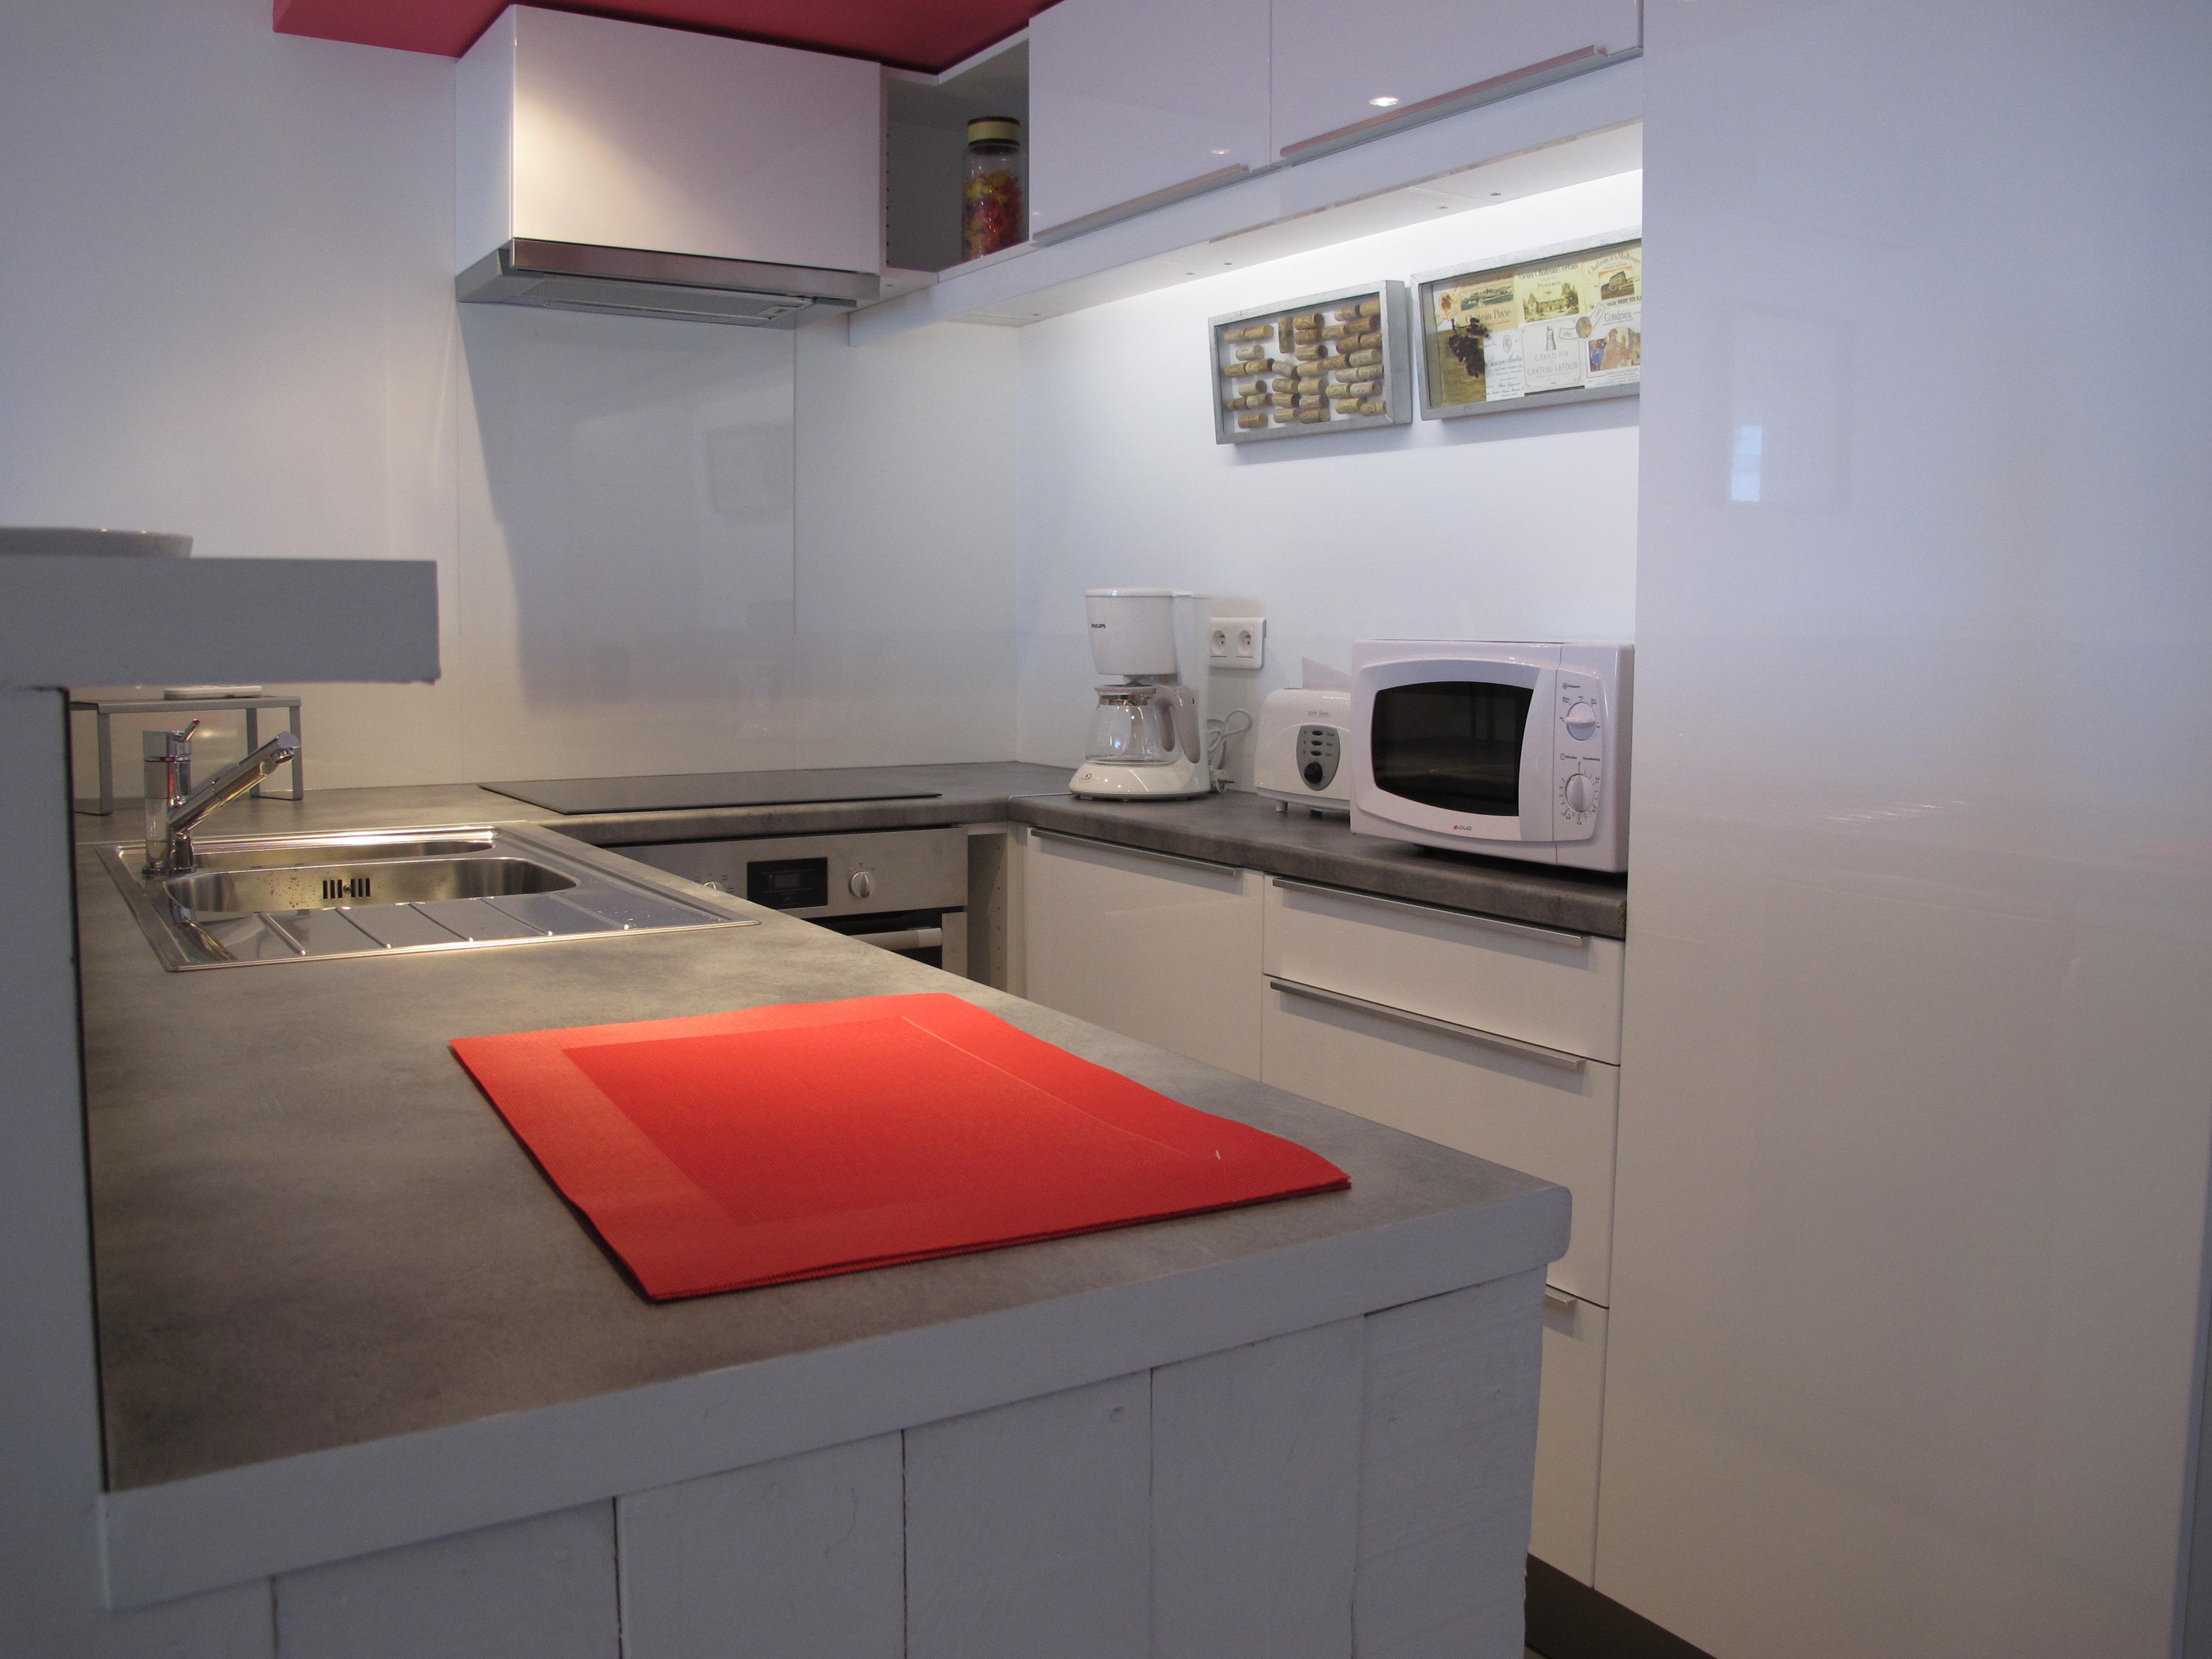 g te framboise l 39 esperluette en provence. Black Bedroom Furniture Sets. Home Design Ideas